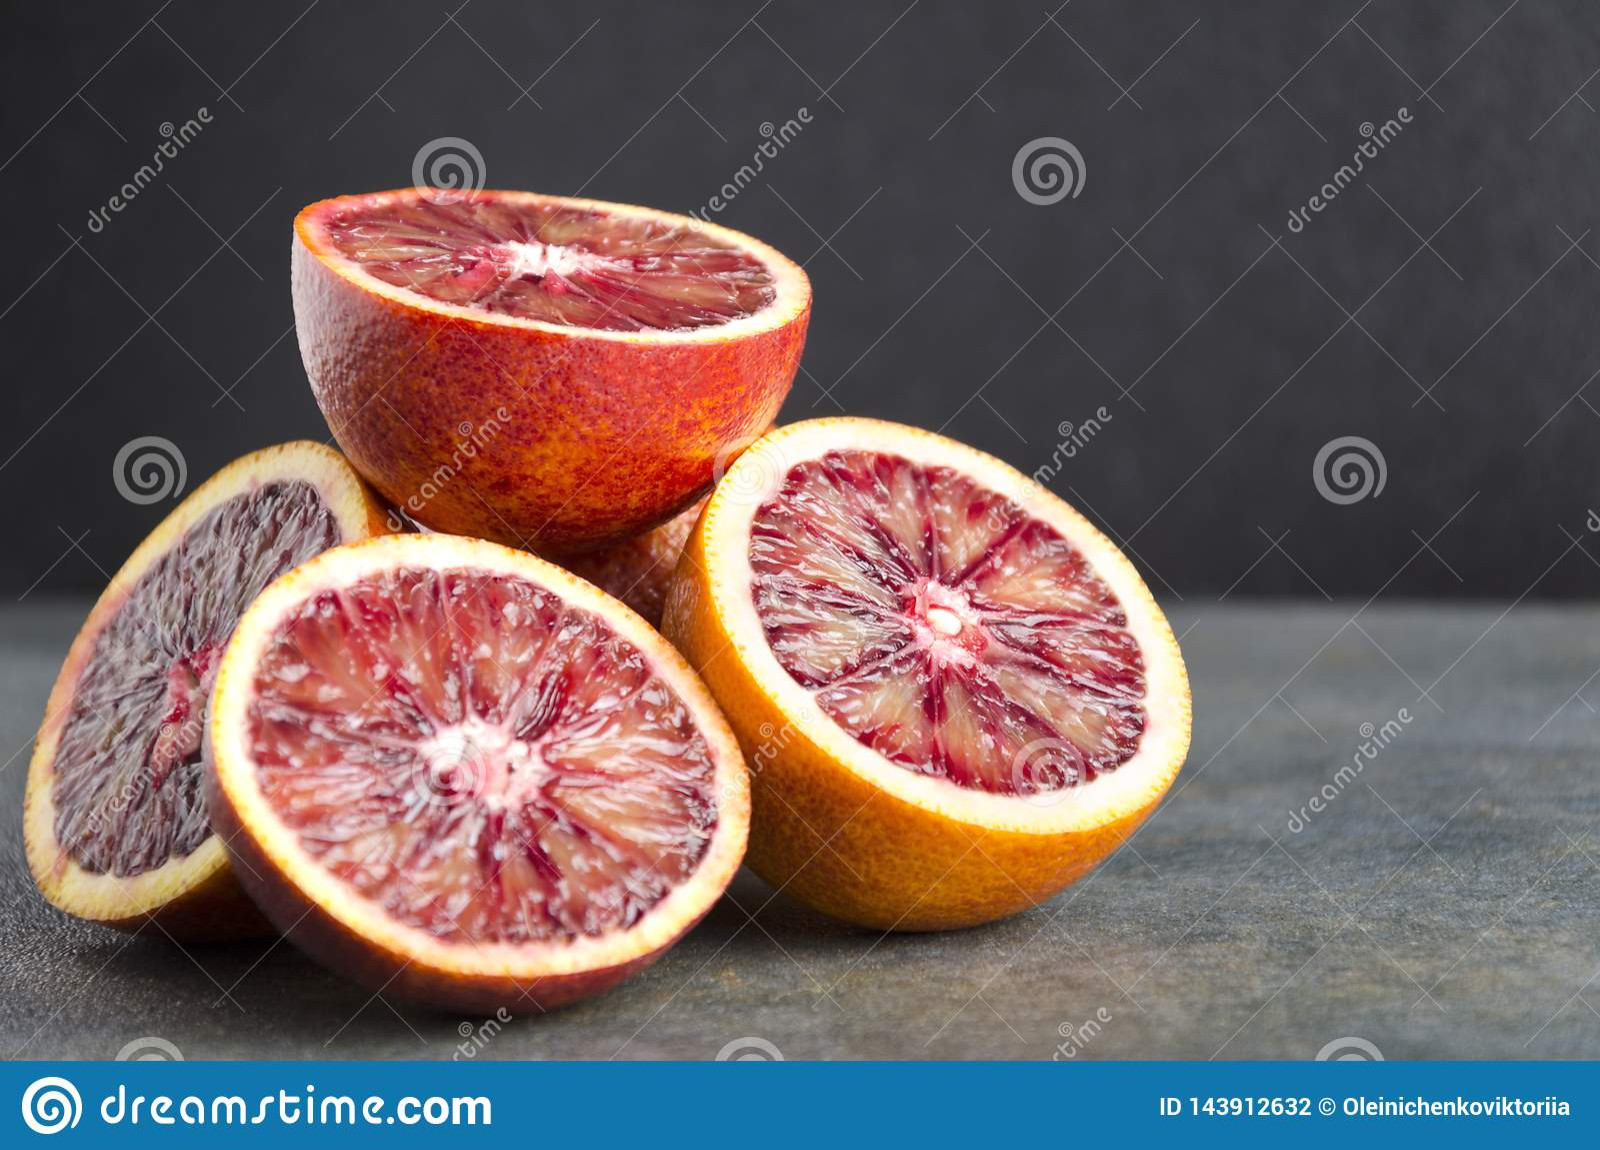 Closeup of halves of bloody oranges on grey table against black background.Fresh sicilian oranges